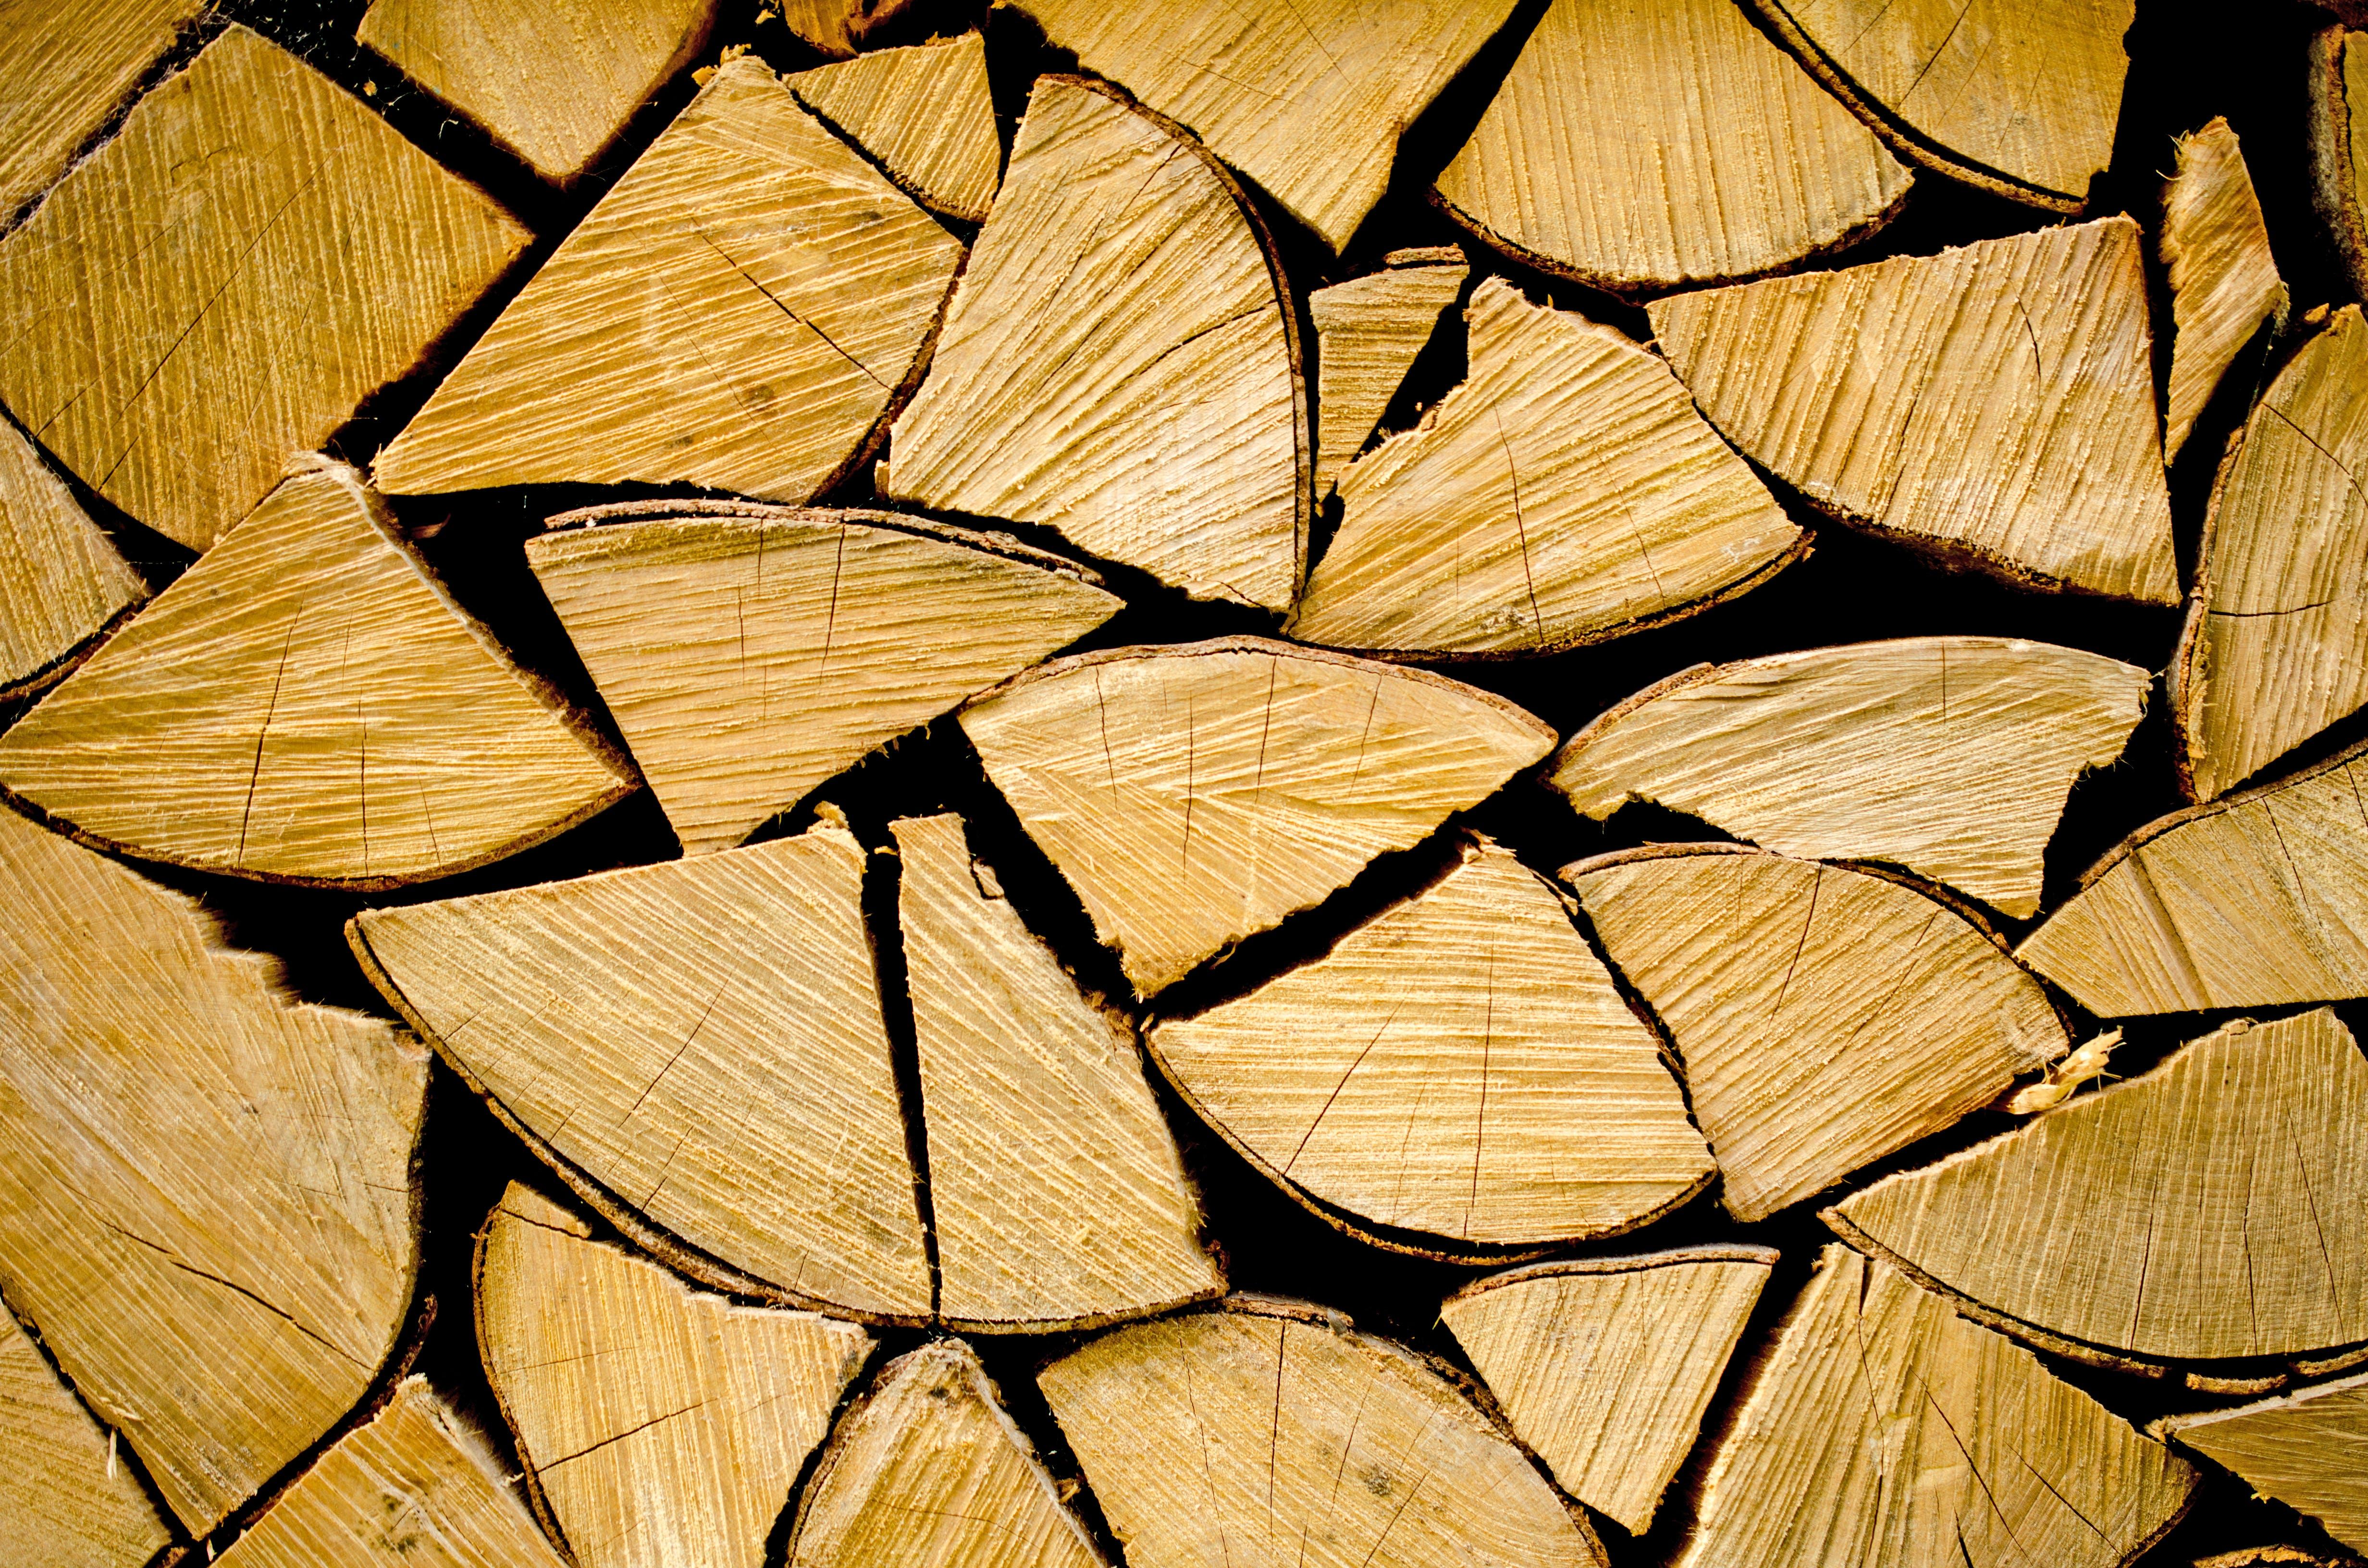 Kostenloses Stock Foto zu alternative energie, brennholz, energie, holzstapel